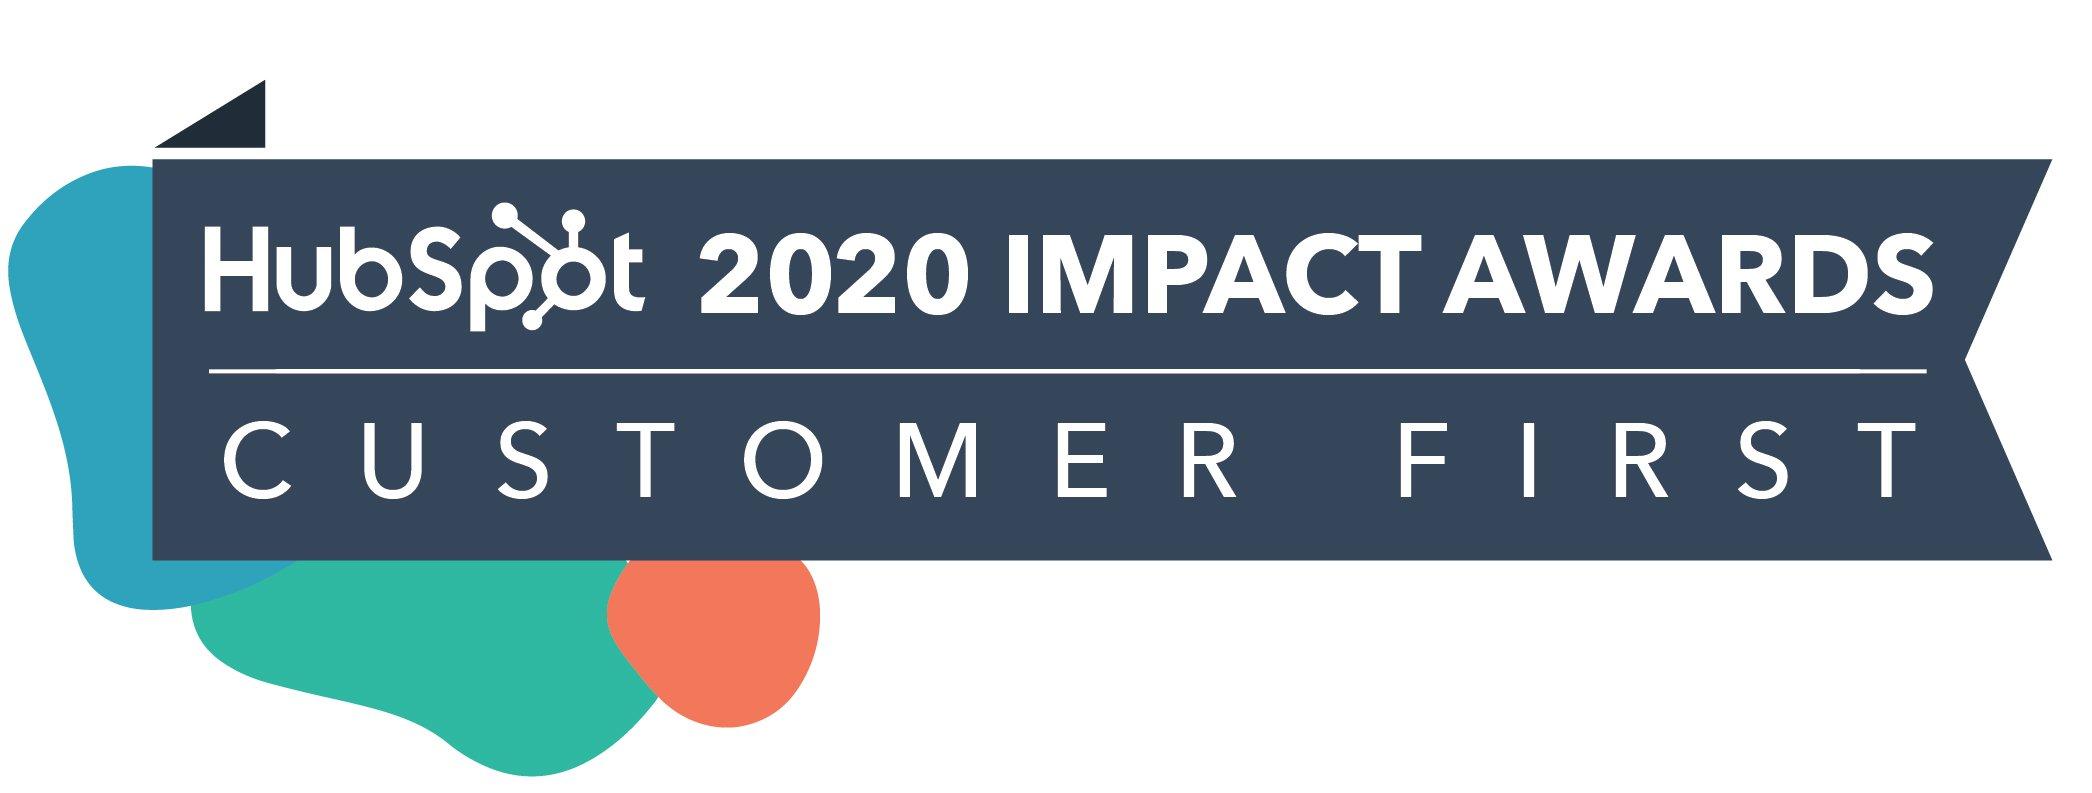 HubSpot_ImpactAwards_2020_CustomerFirst3